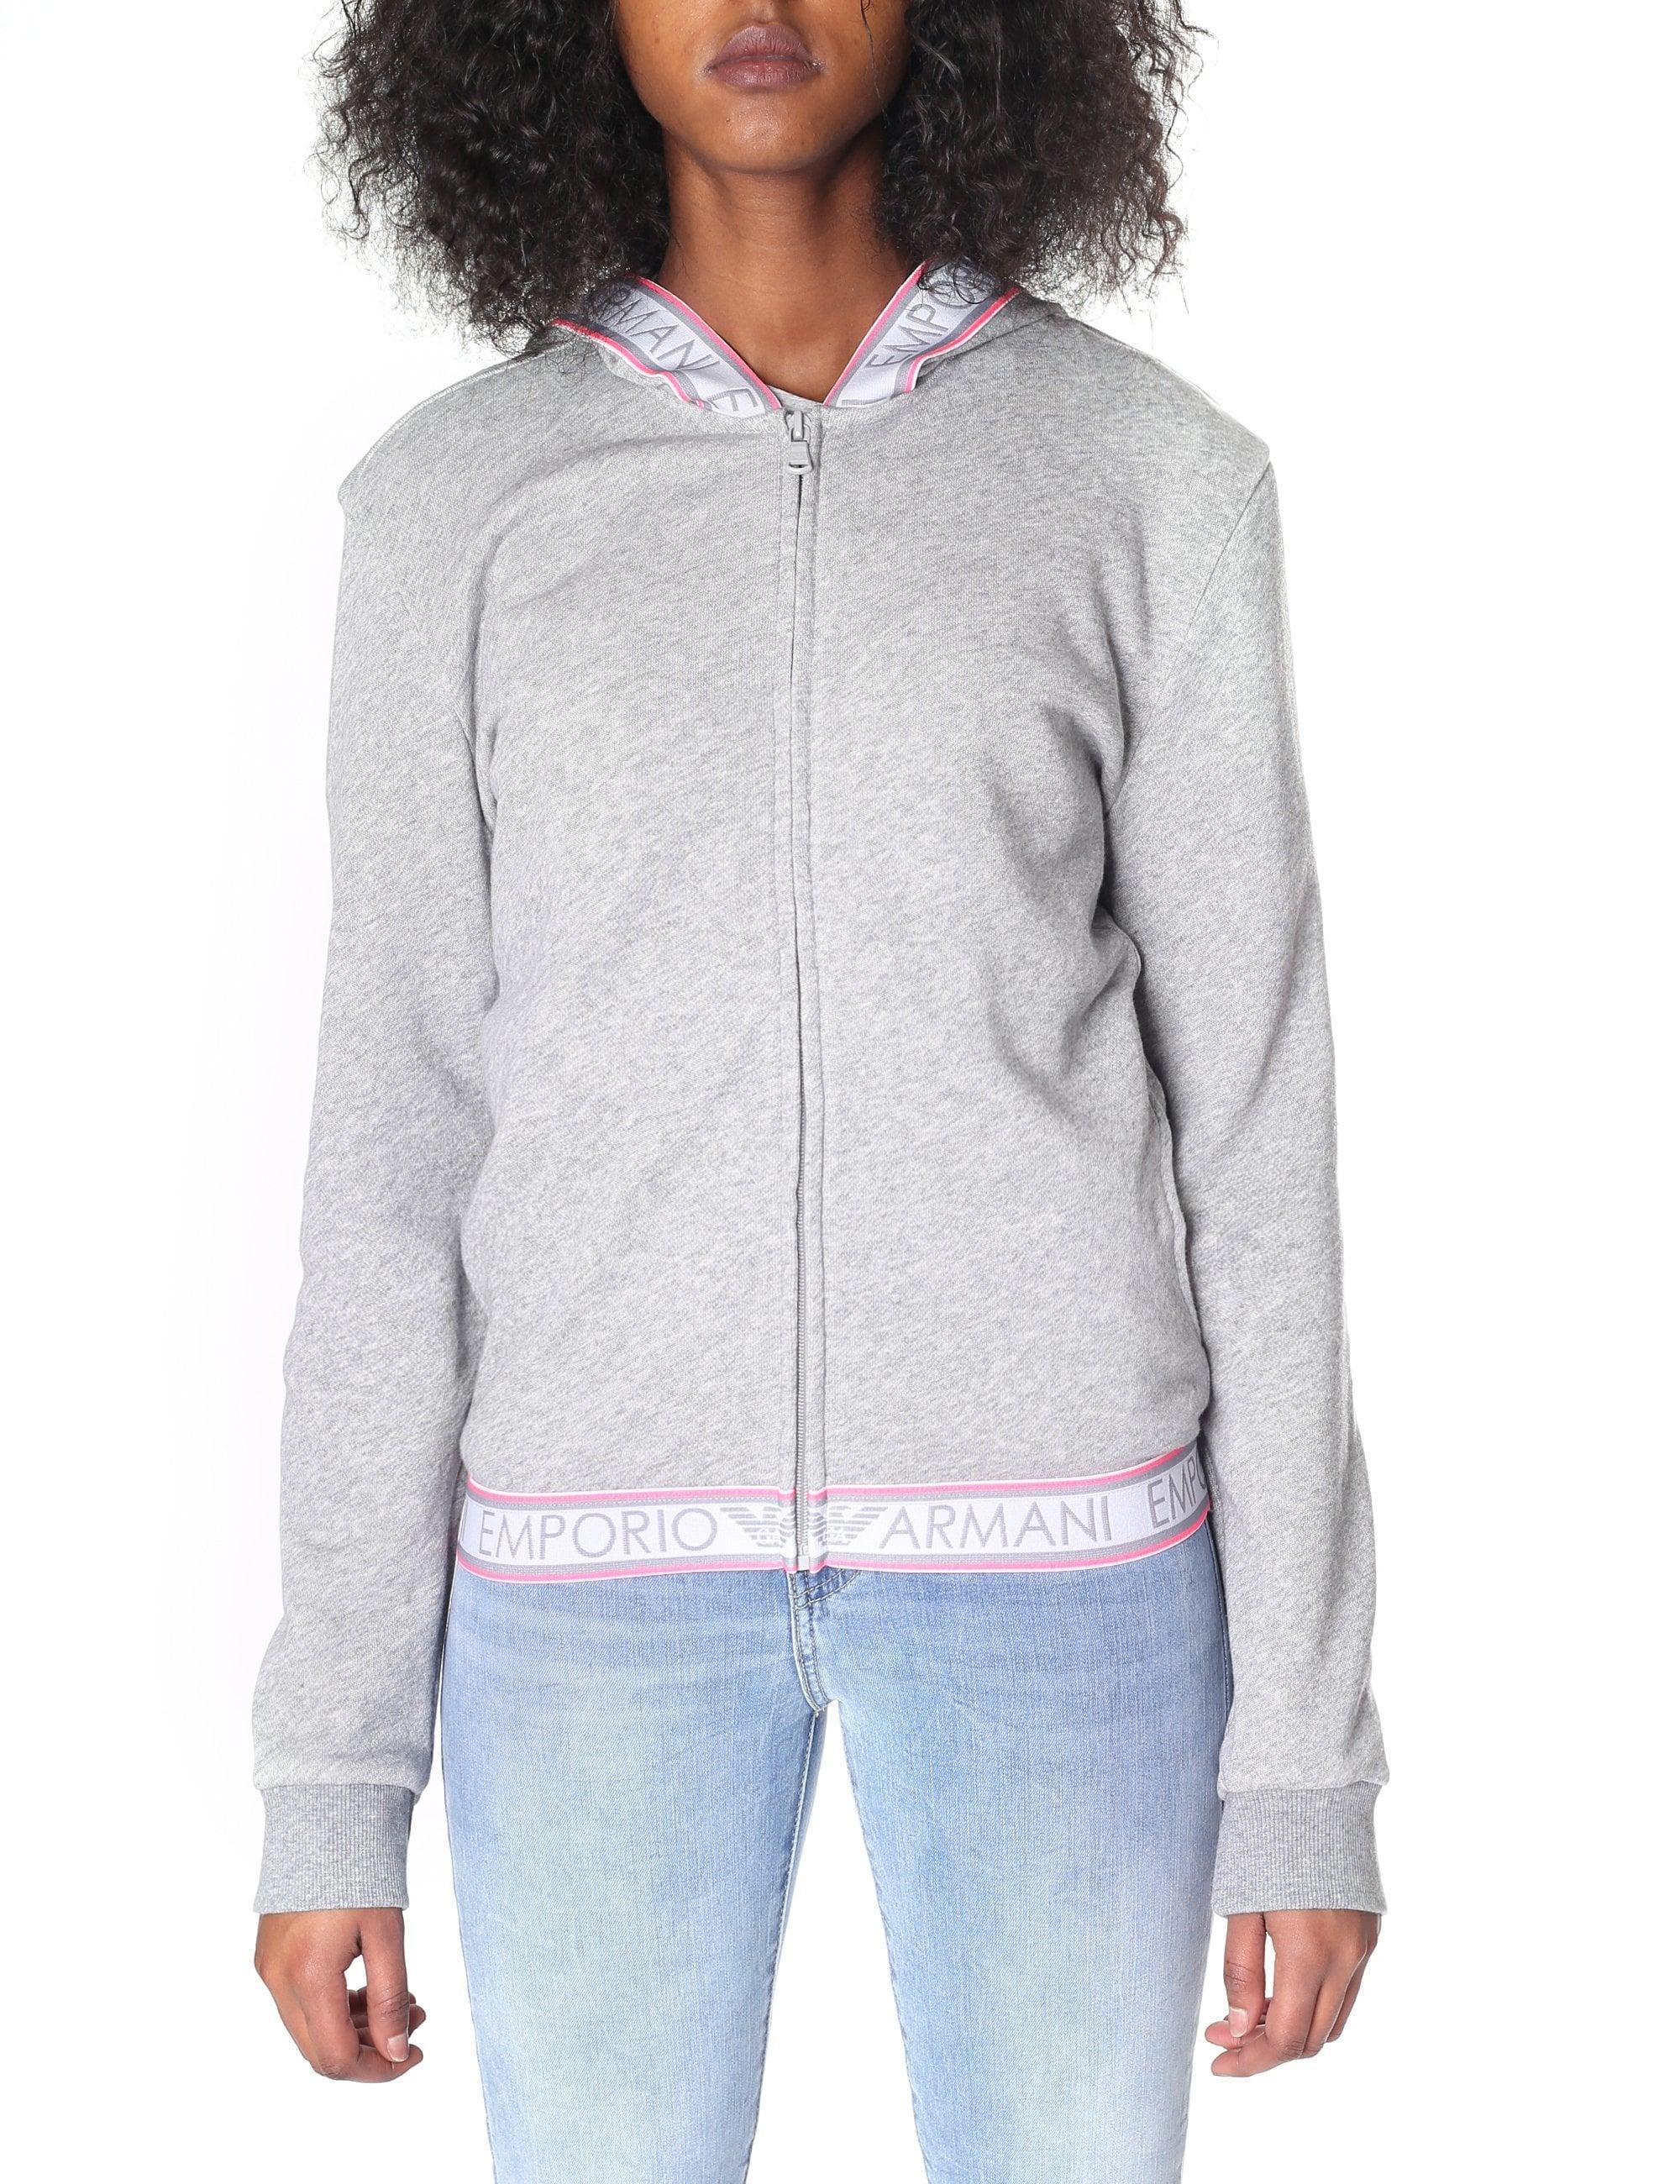 c4d3da505c Emporio Armani Logo Tape Zip Through Hooded Sweat Top in Gray - Lyst